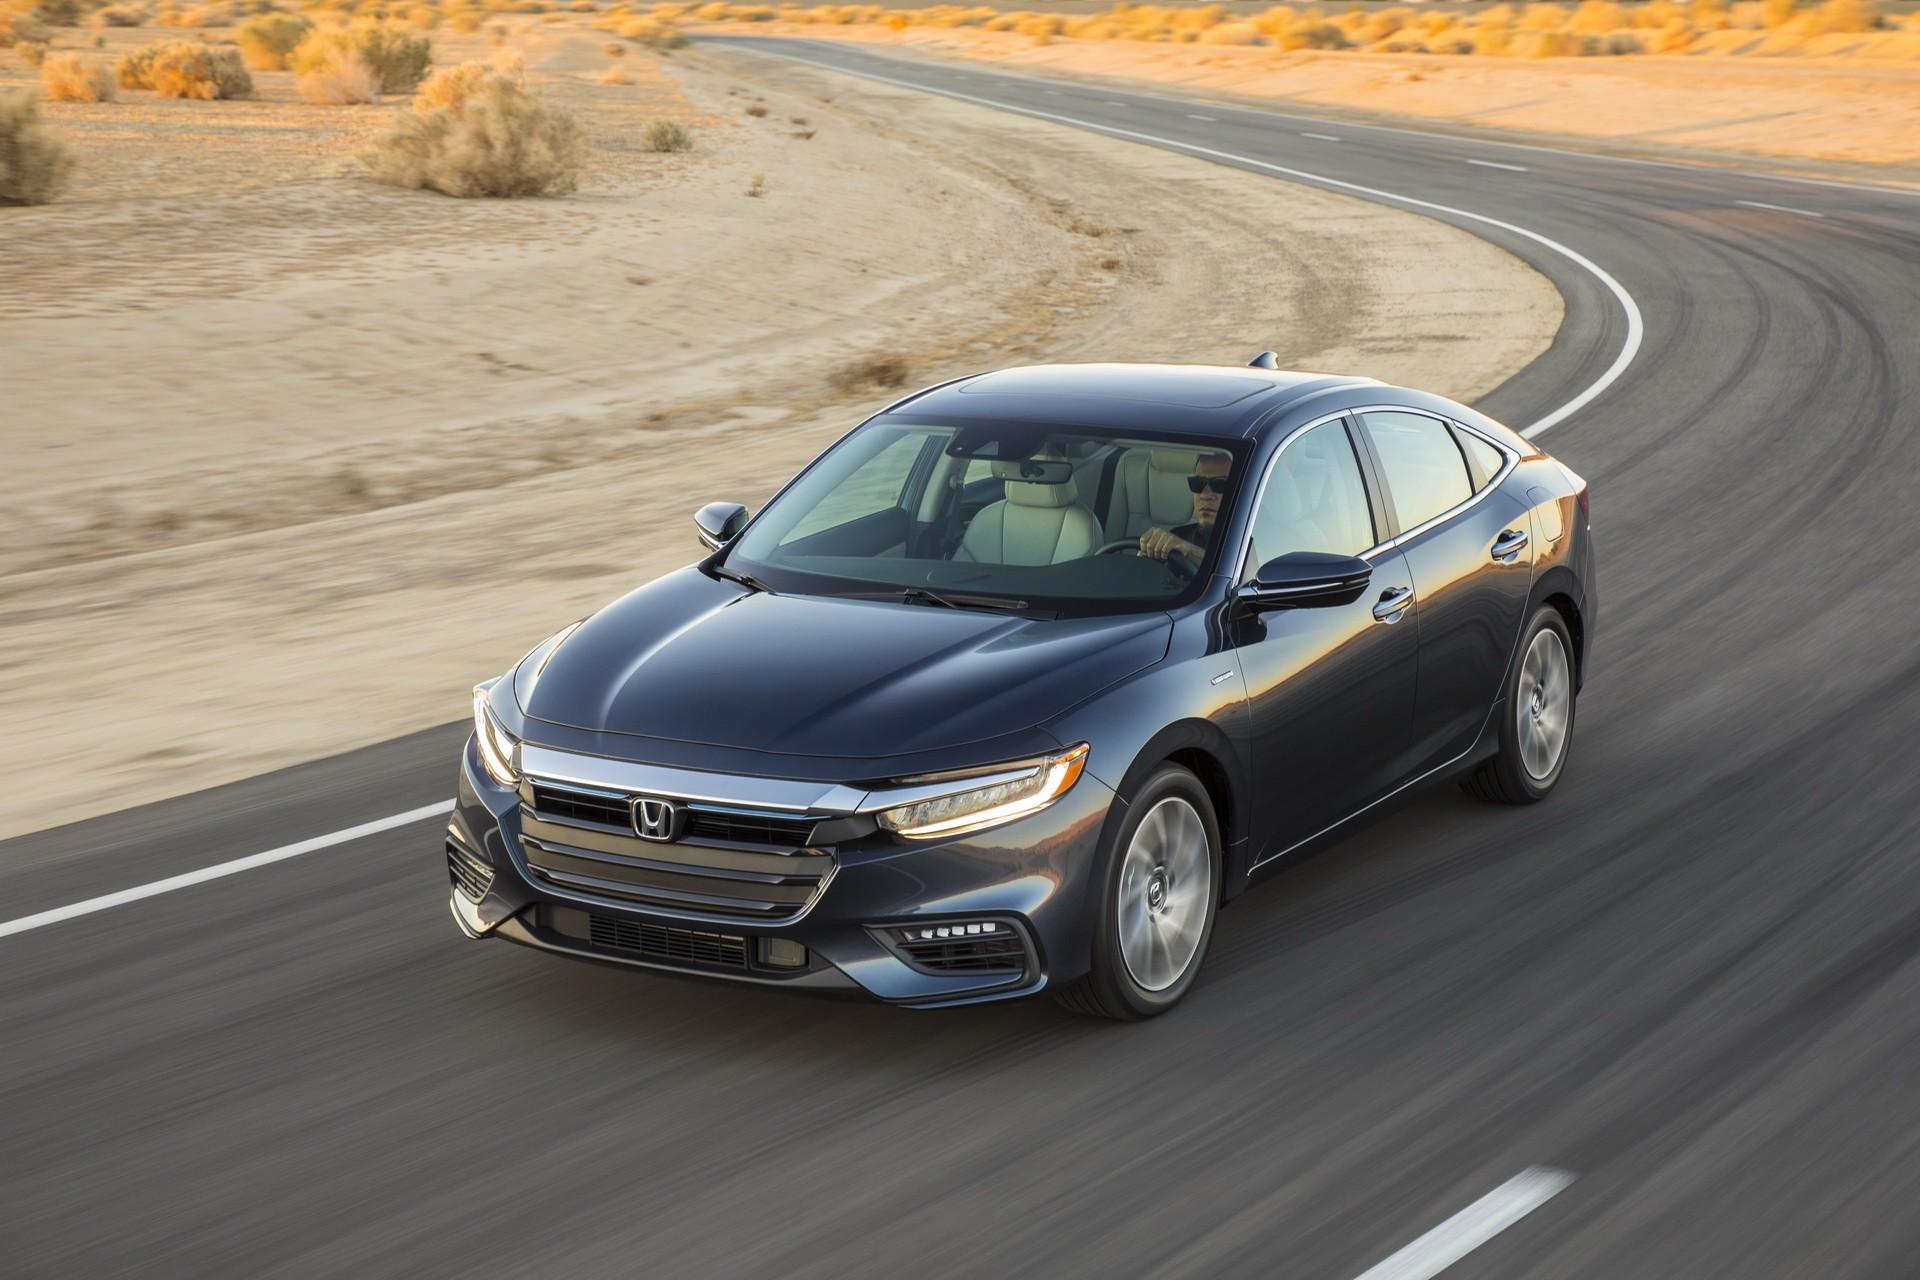 2019 Honda Insight Revealed In Production Ready Form